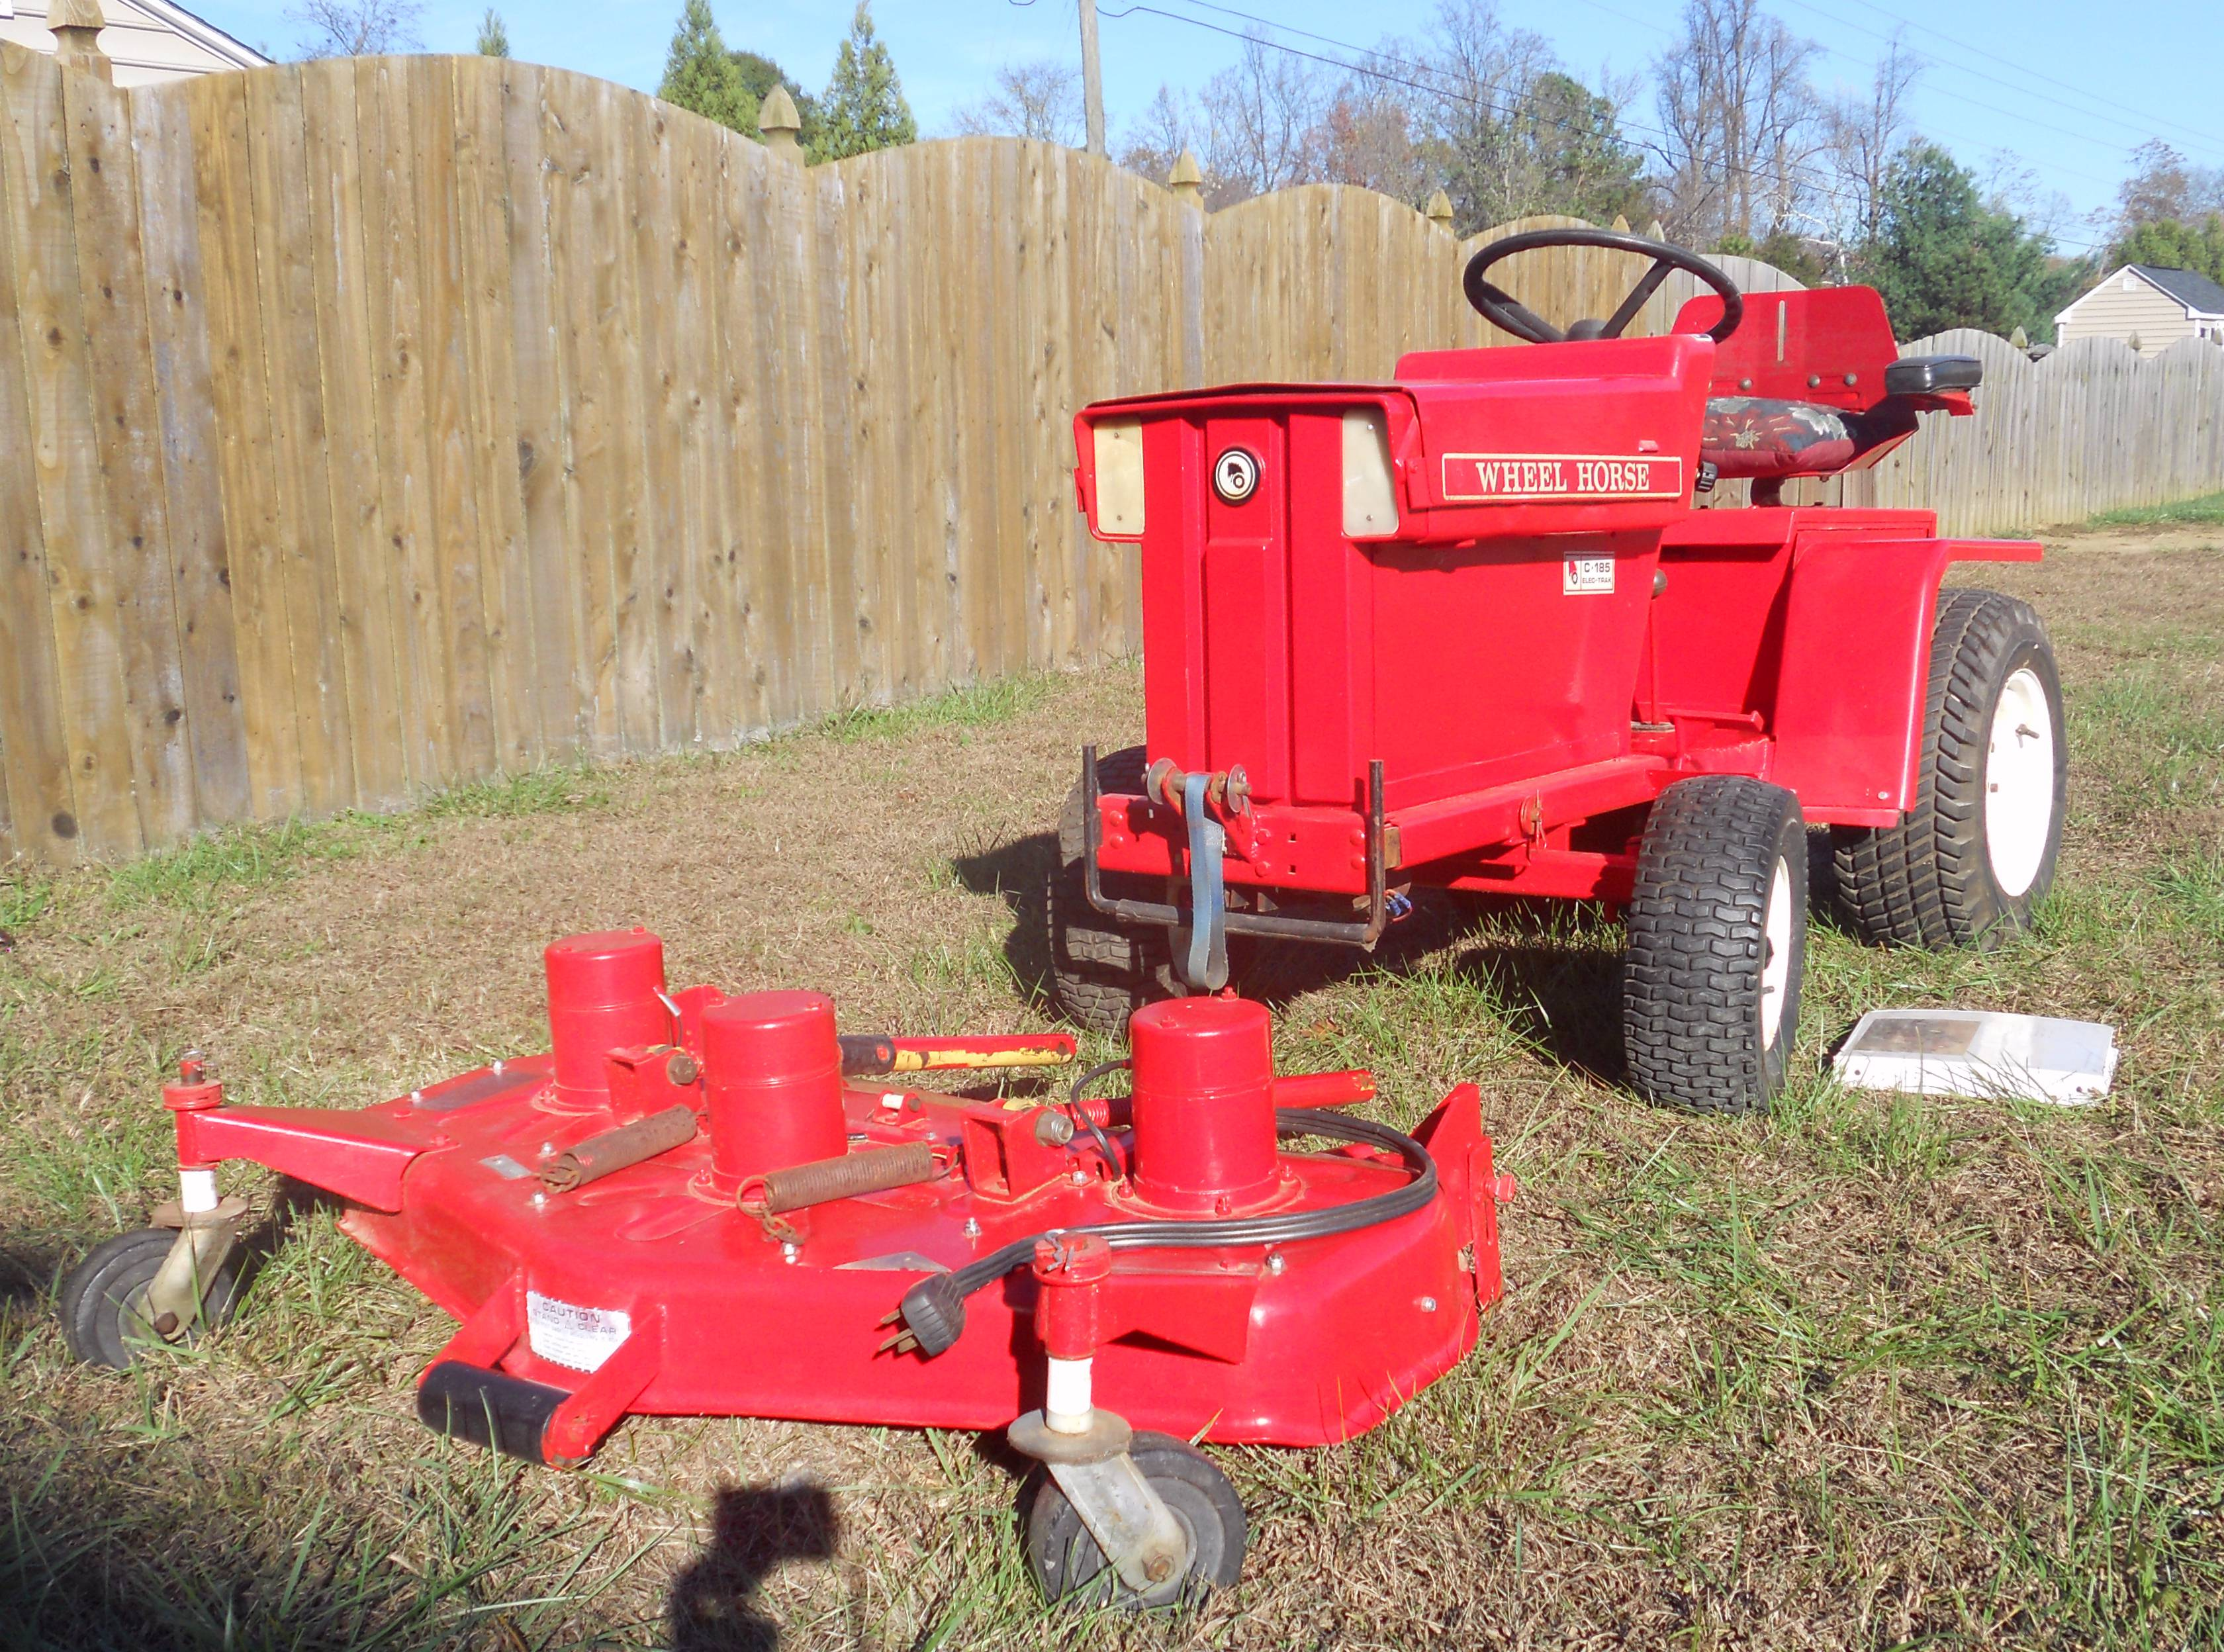 wiring diagram wheel horse lawn tractor imit boiler thermostat 416 c 160 elsavadorla